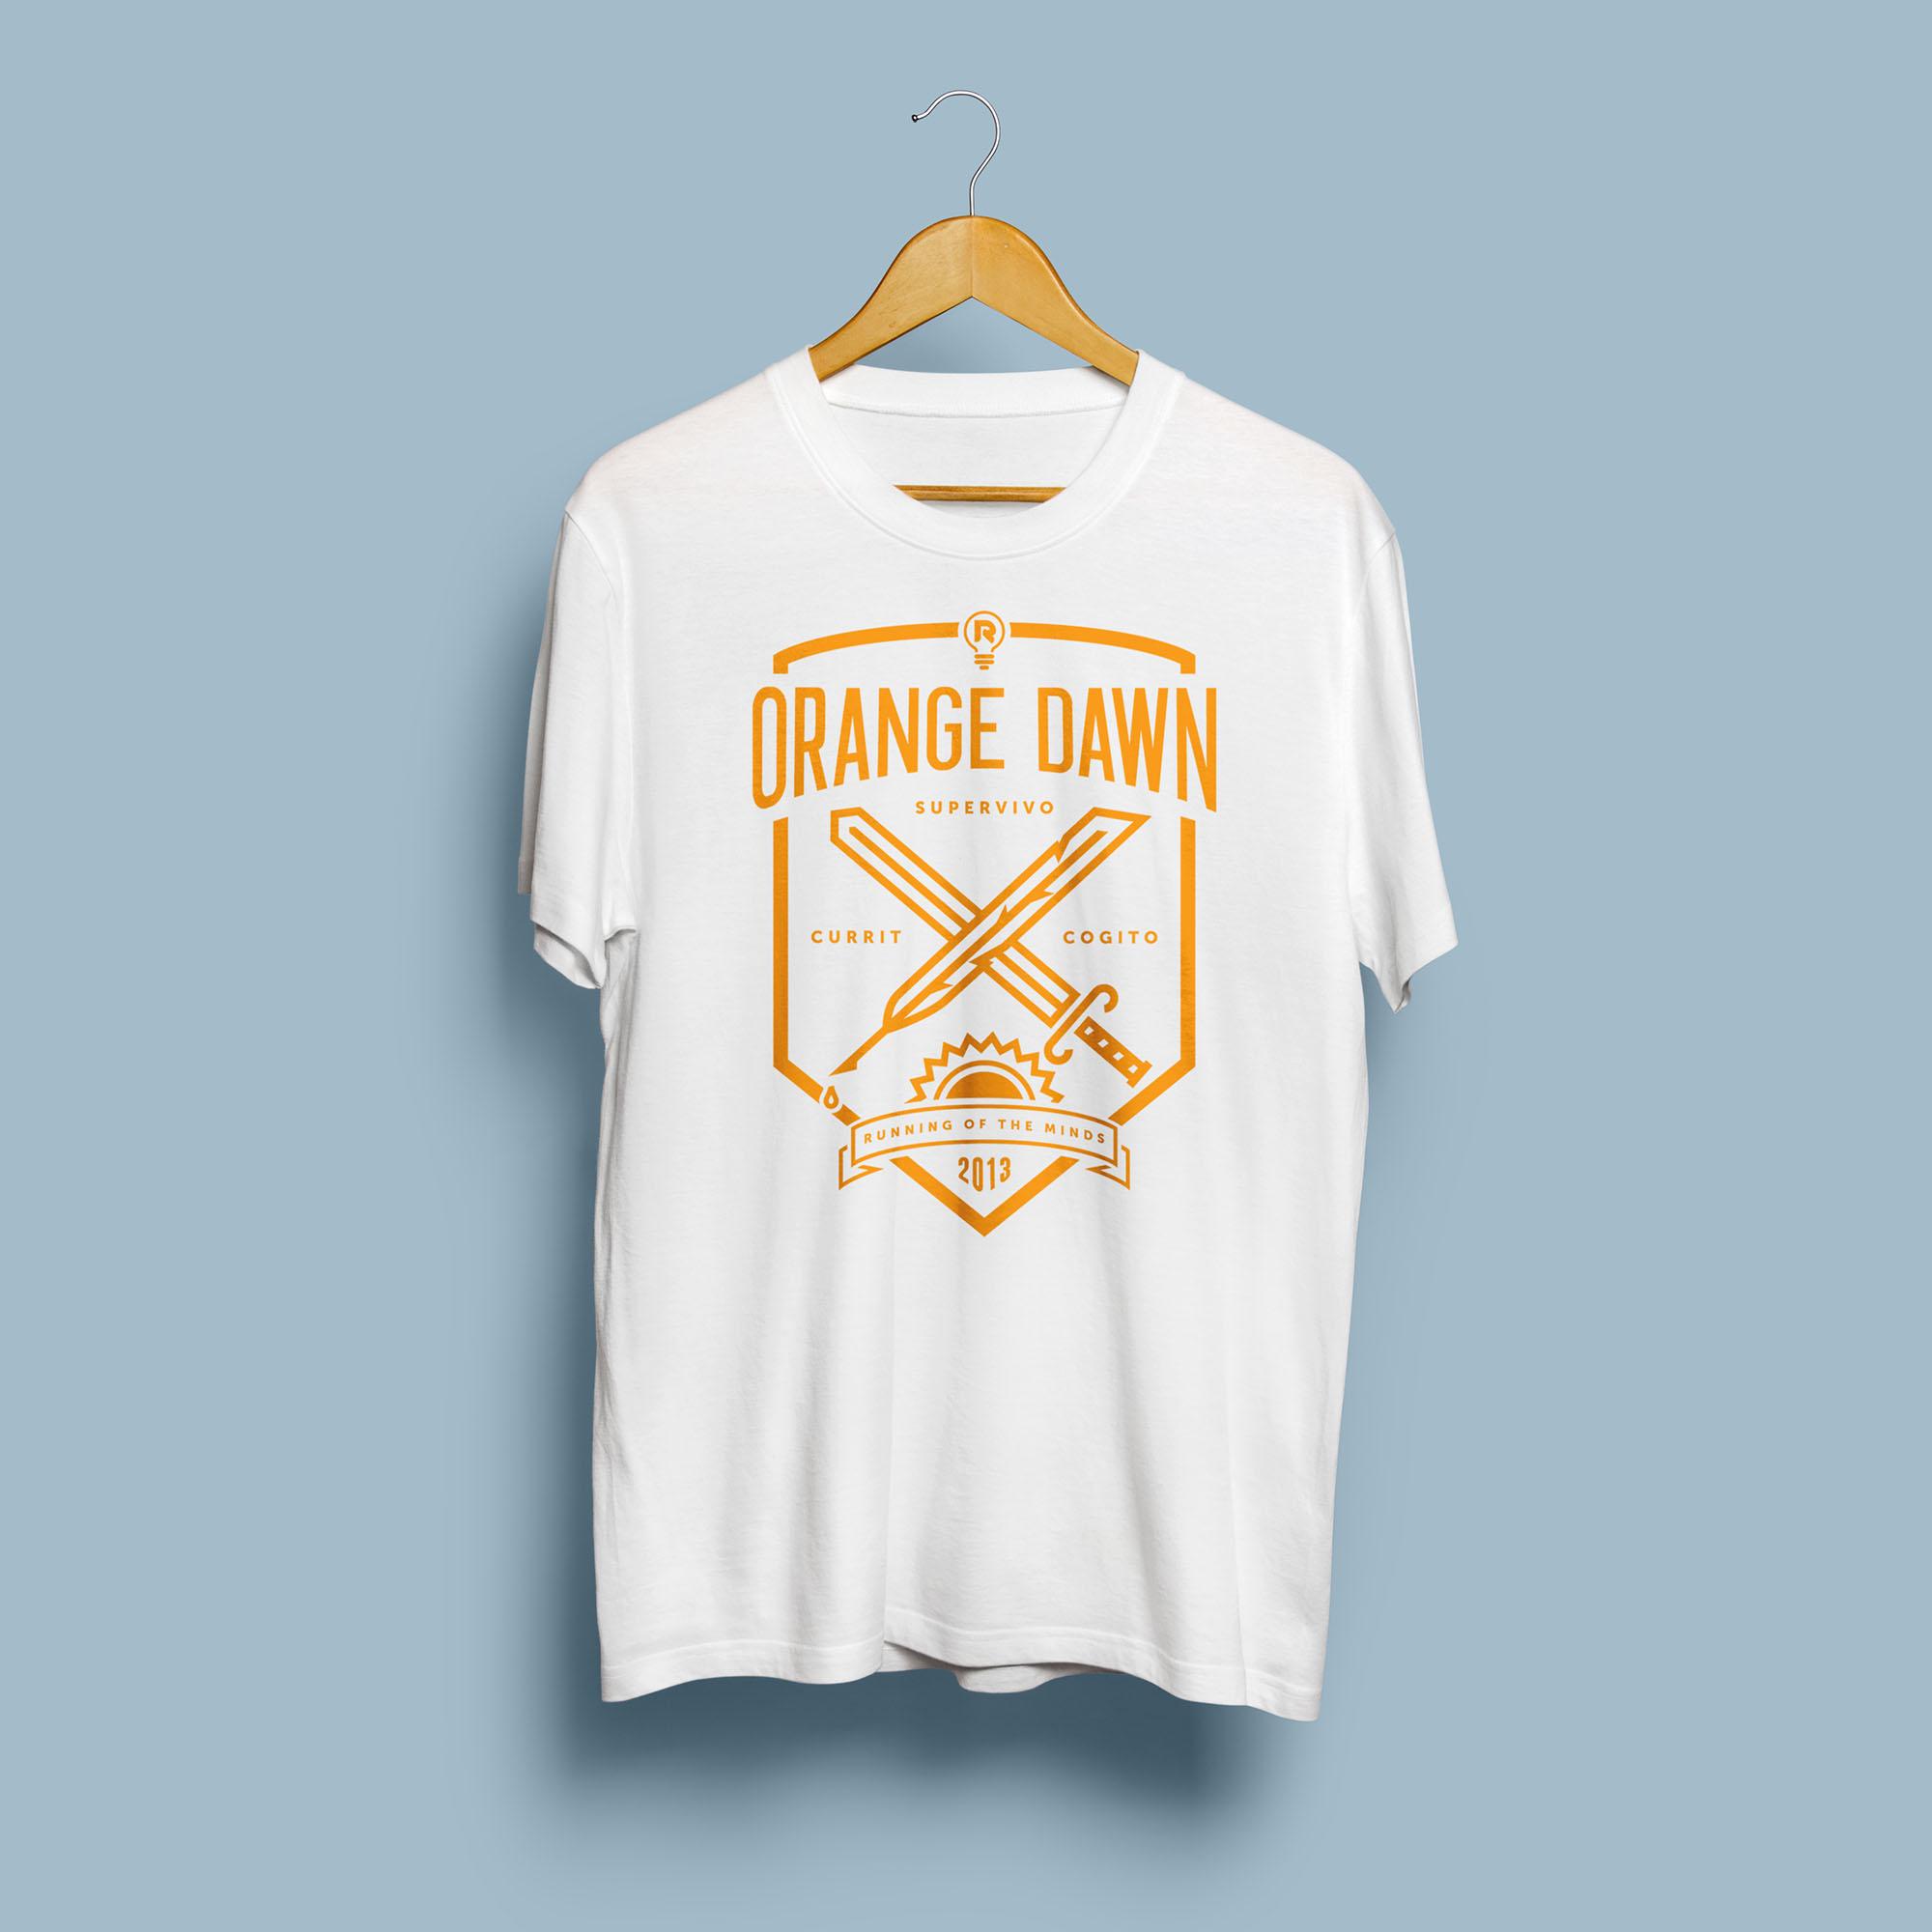 orangedawn_002